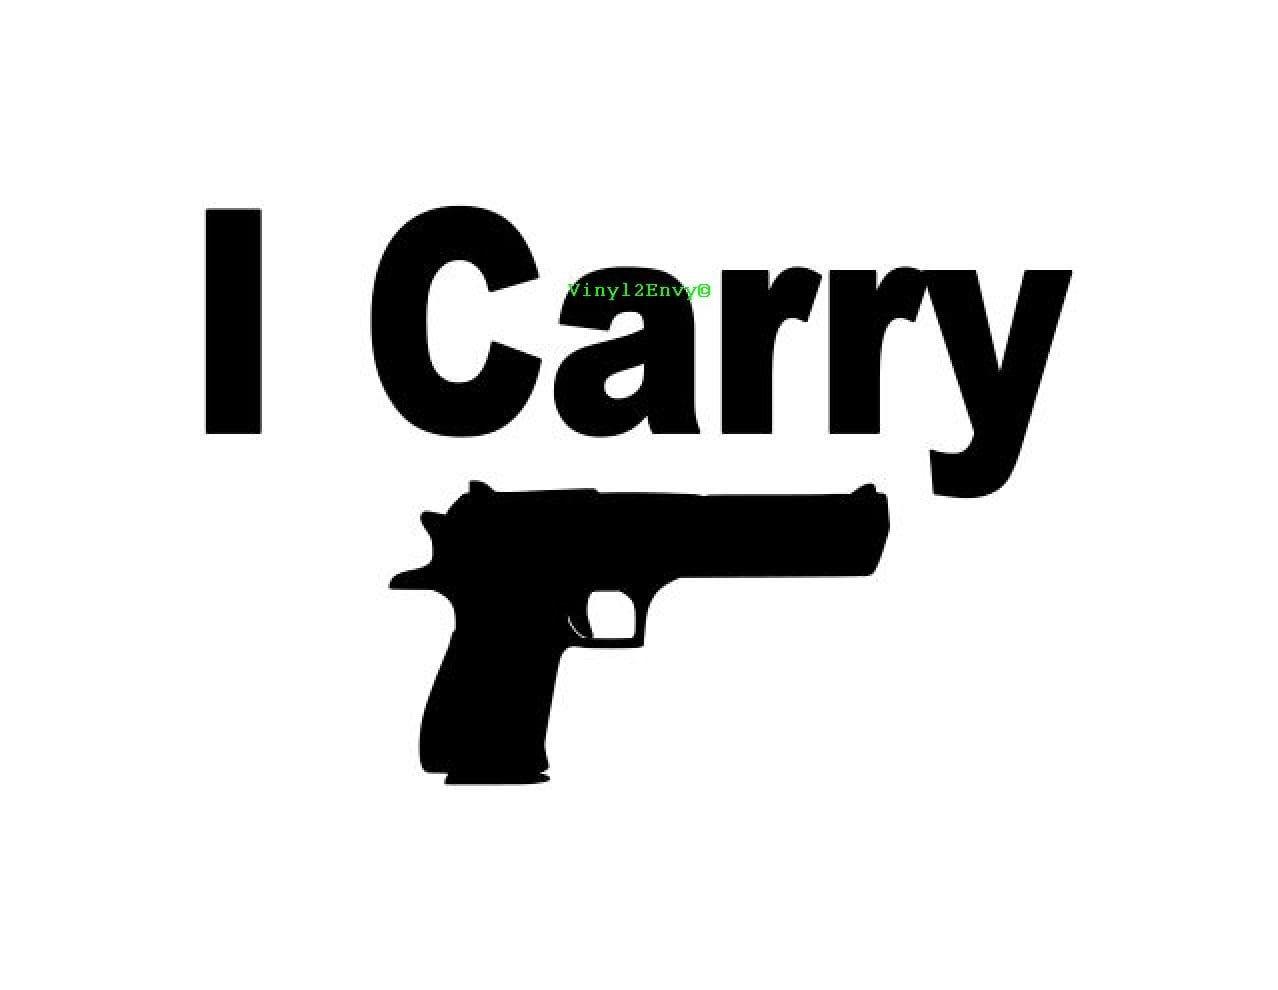 I Carry Gun Decal Car Decal Vinyl Car Decals Window Etsy